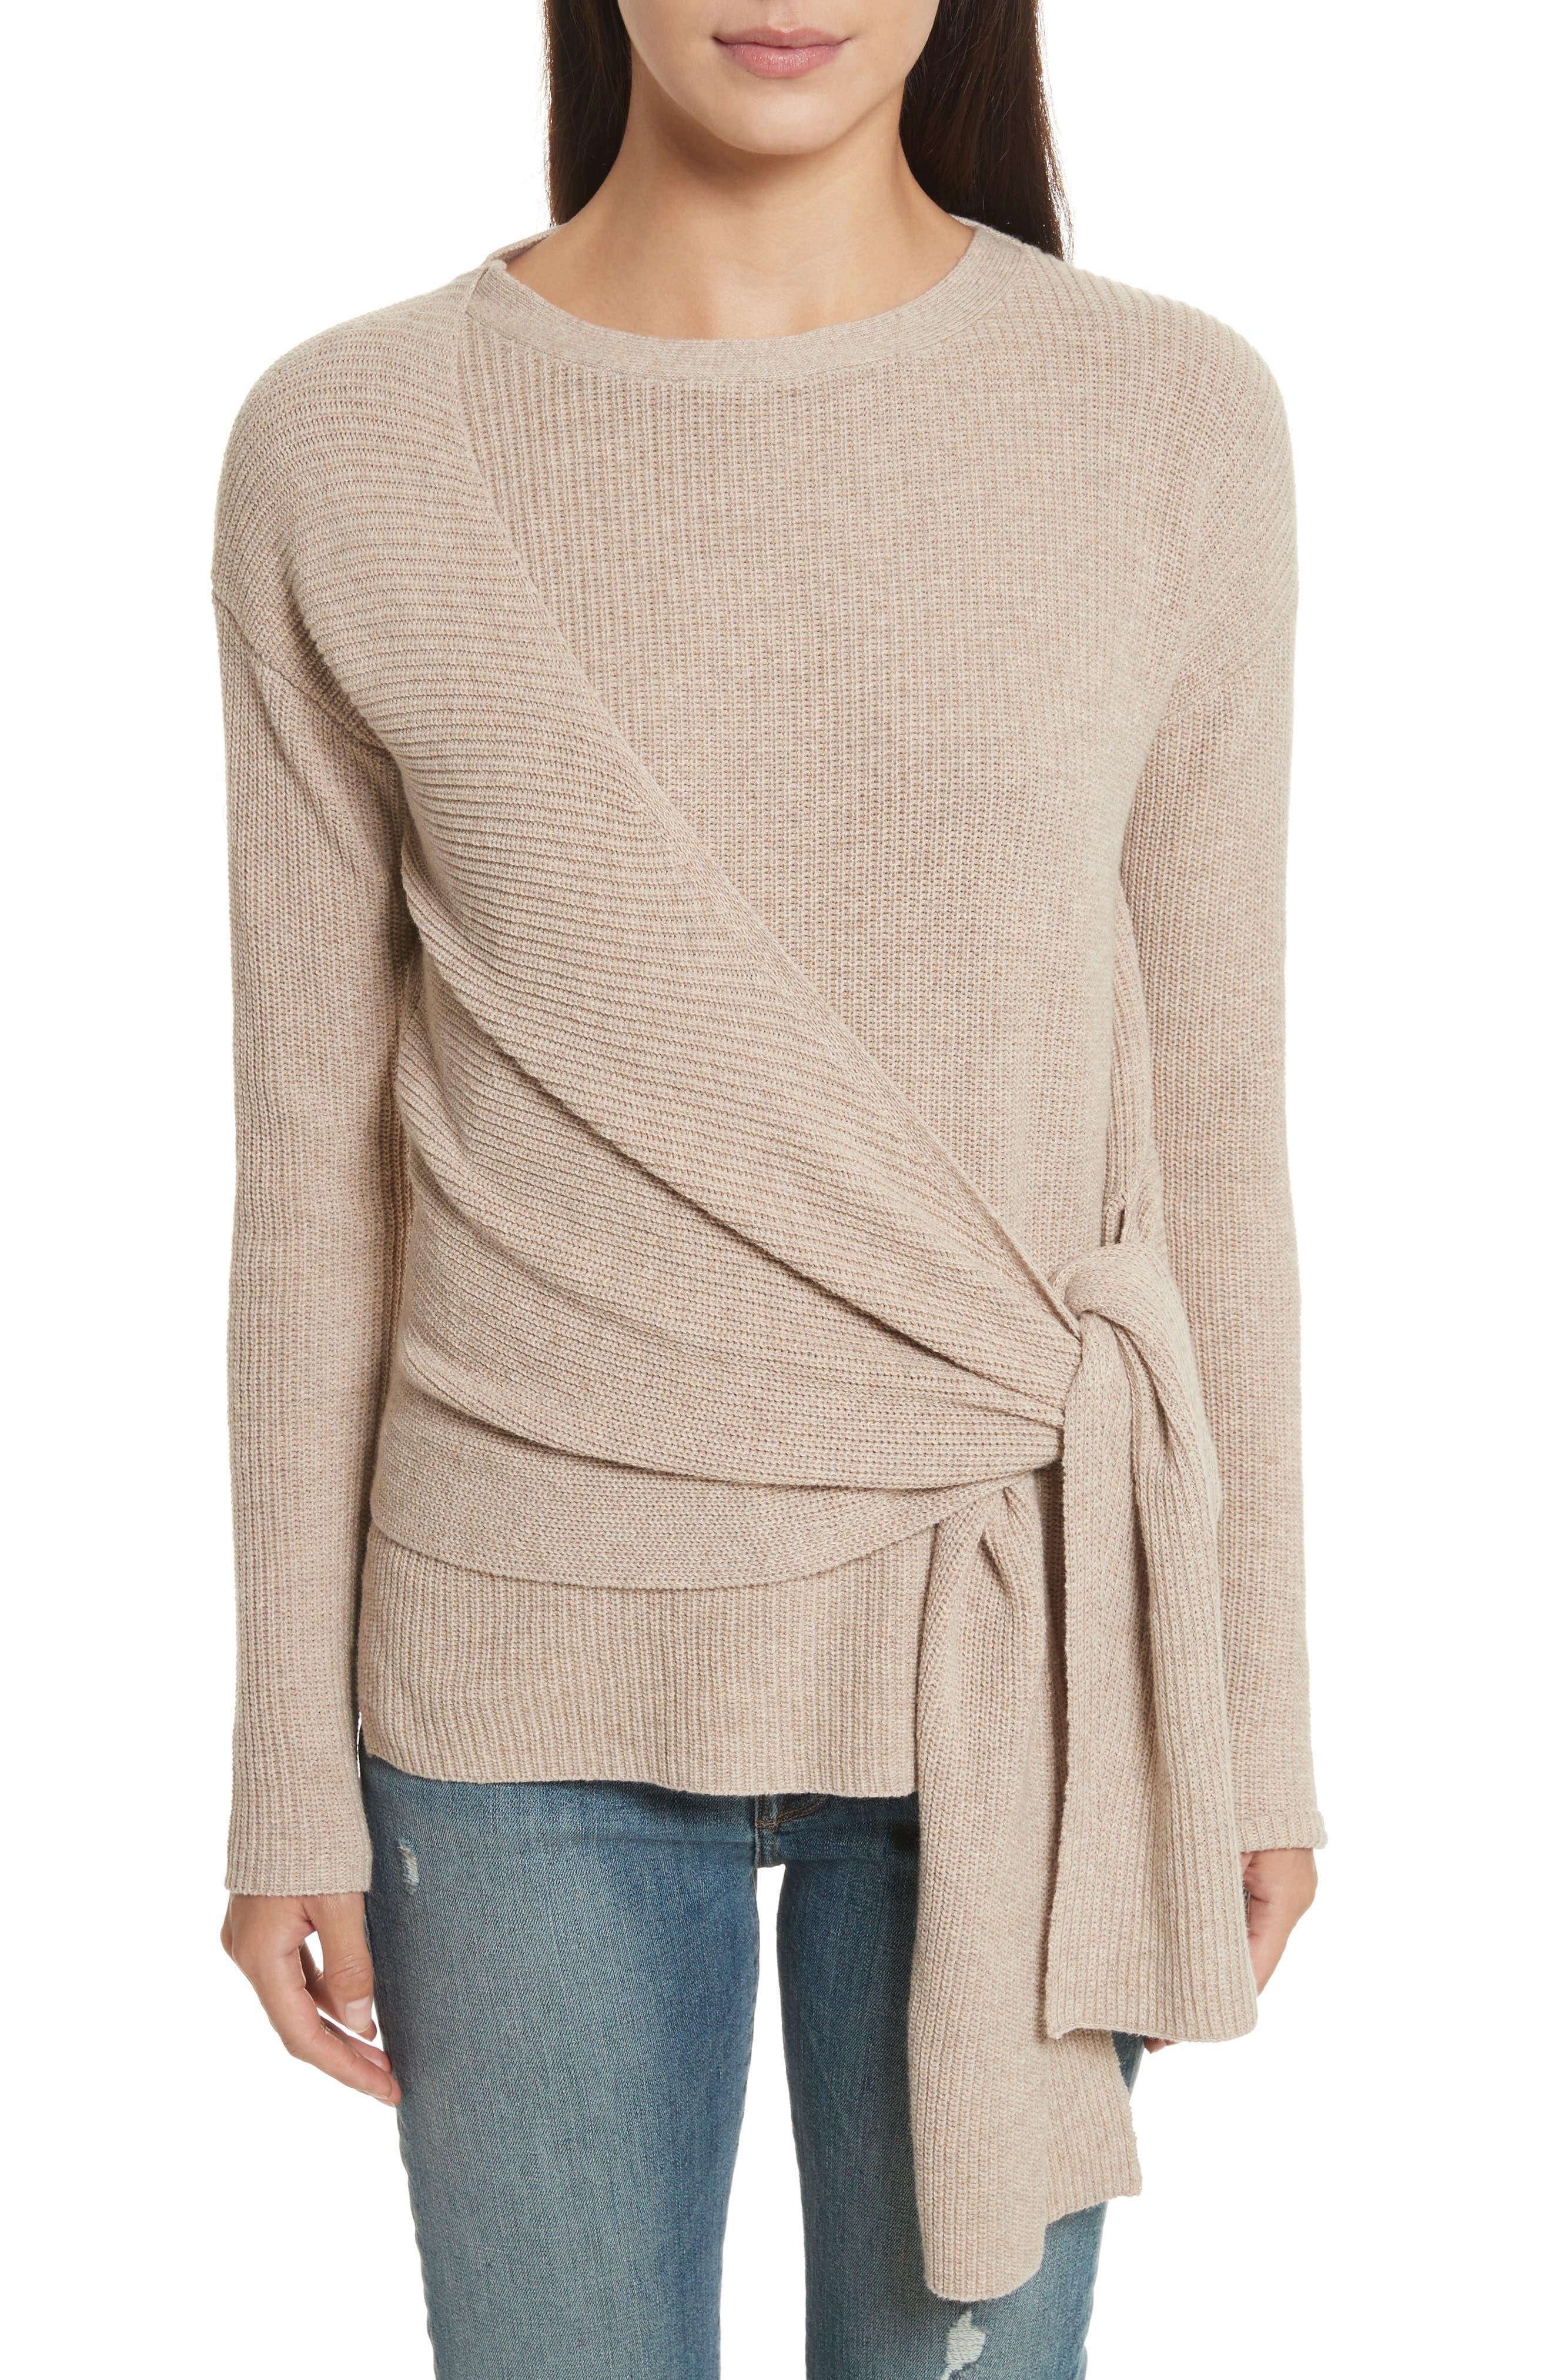 Greys Wrap Sweater,                             Main thumbnail 1, color,                             270